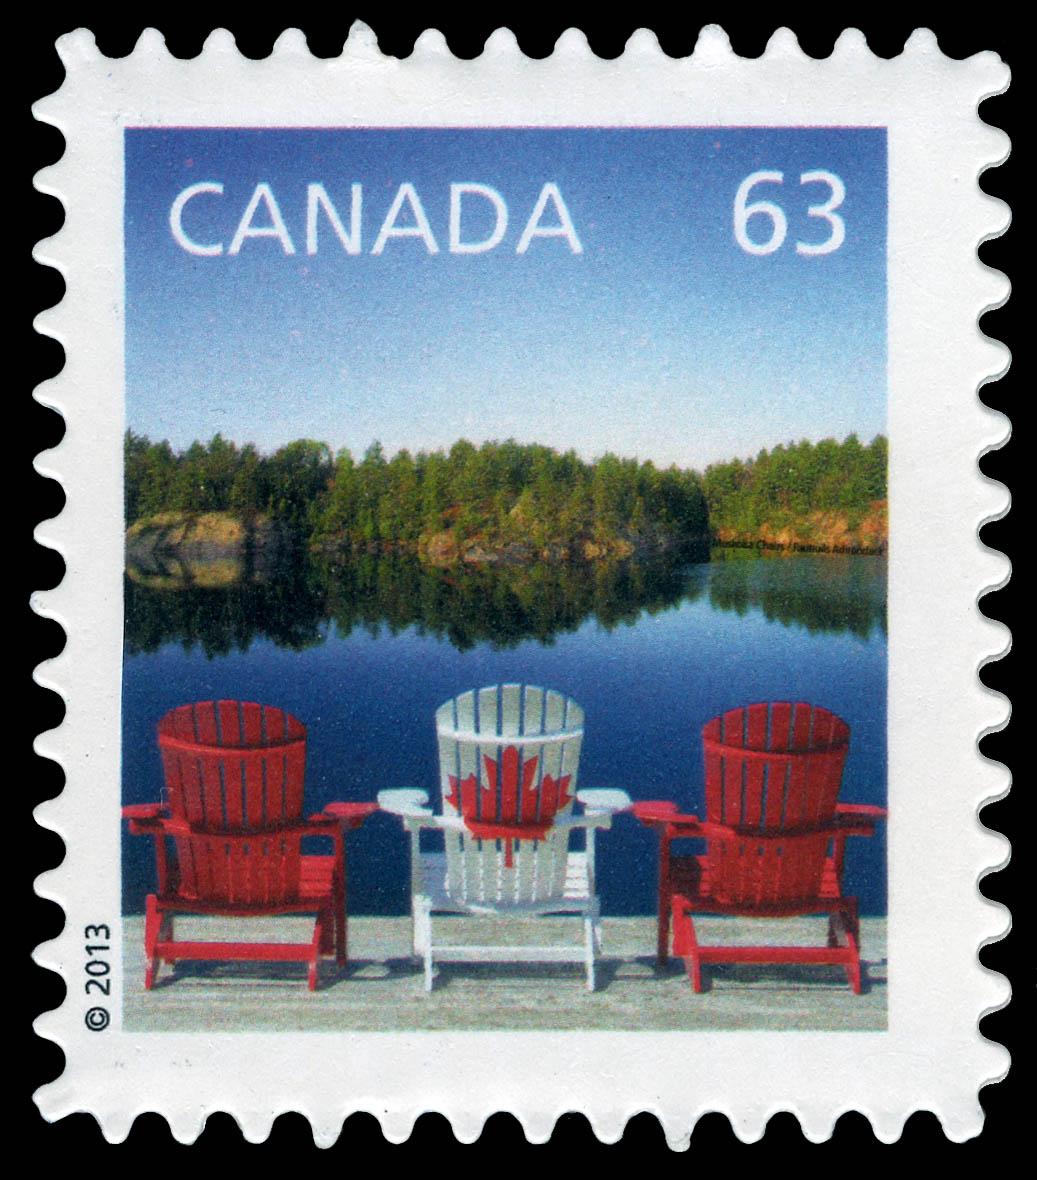 Muskoka Chairs Flag Design Canada Postage Stamp